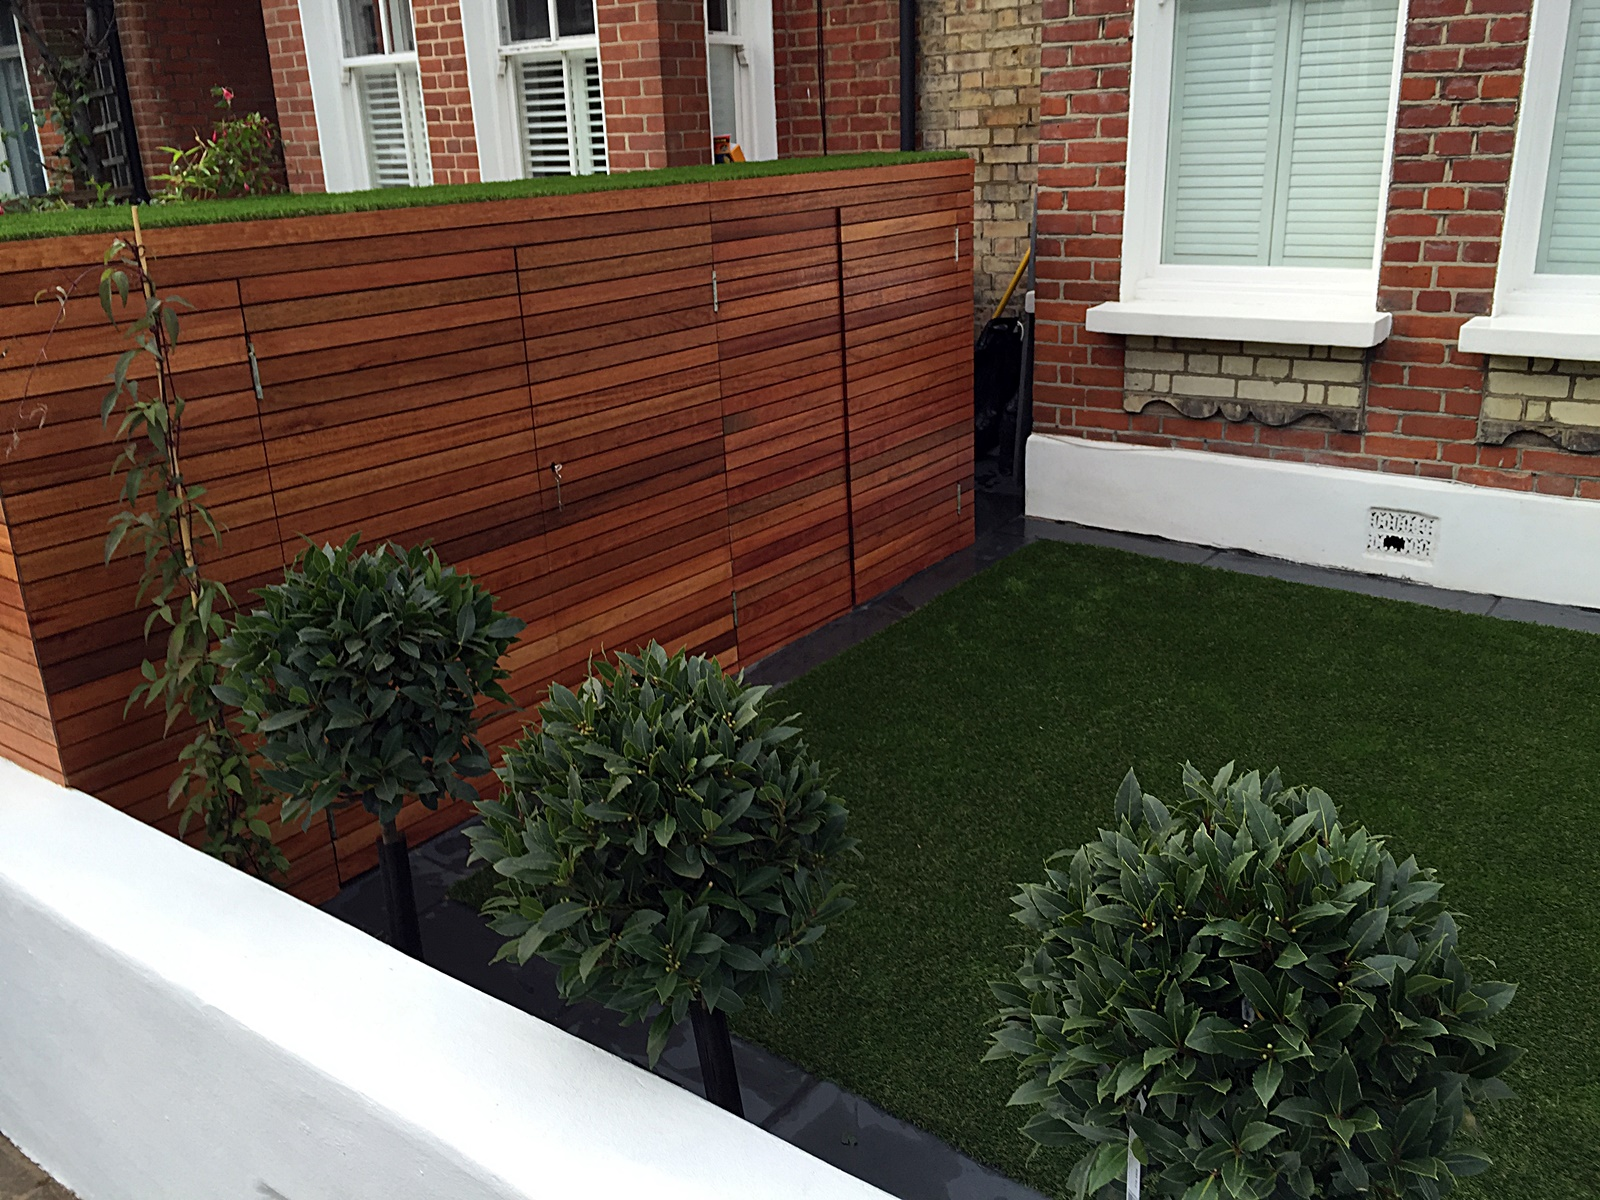 Fake grass Chelsea Putney architectural white garden wall planting ...